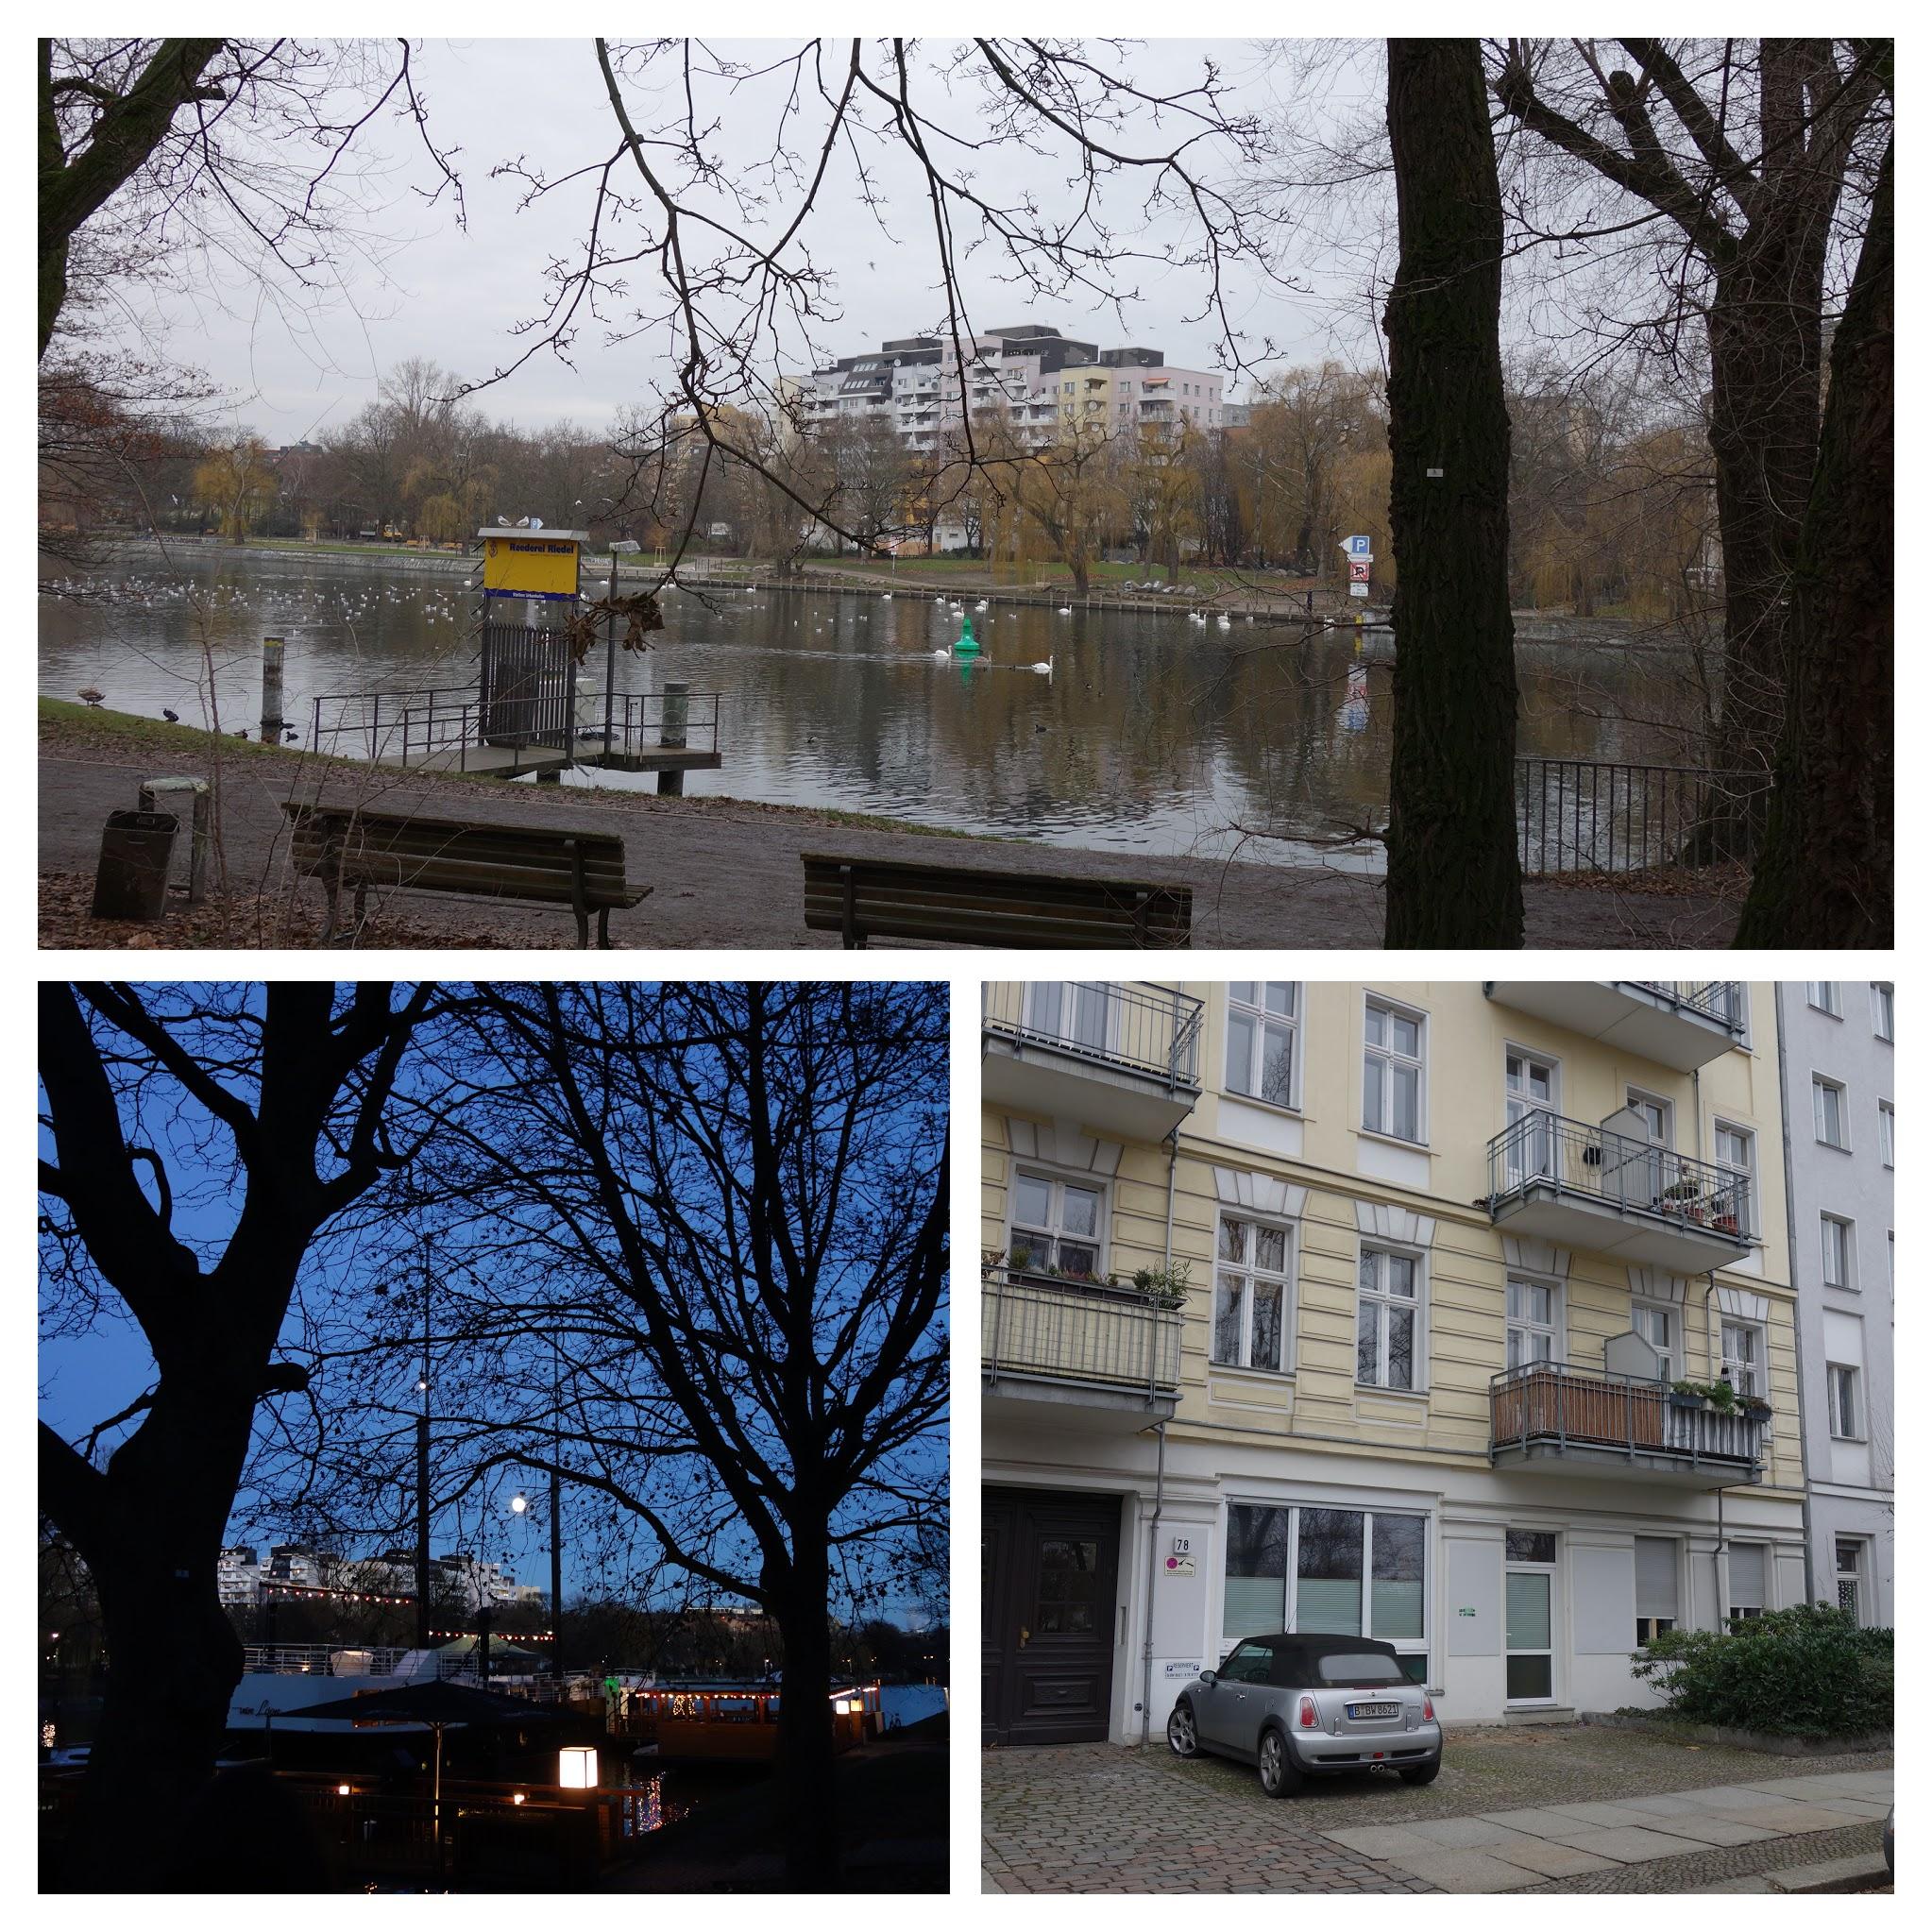 Berlin住地外景 -COLLAGE